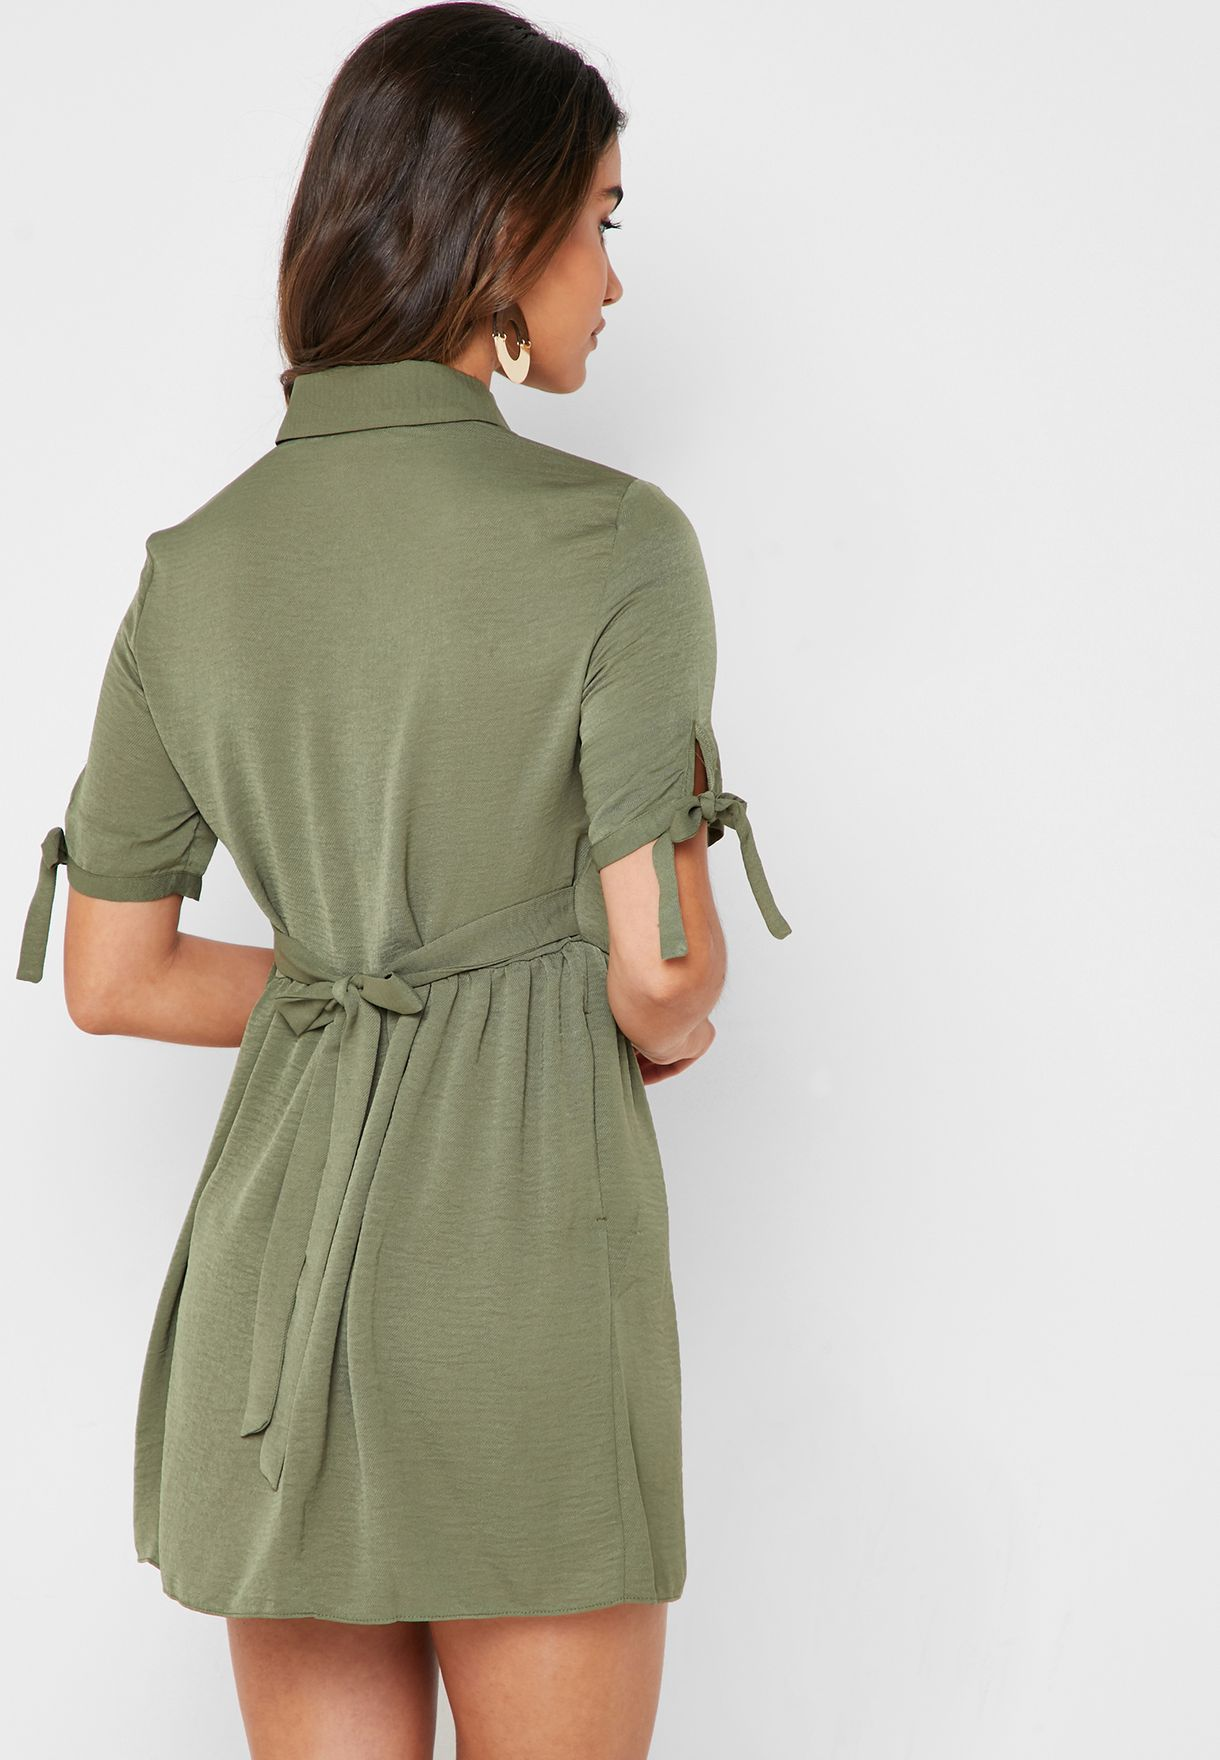 Tie Sleeve Shirt Dress